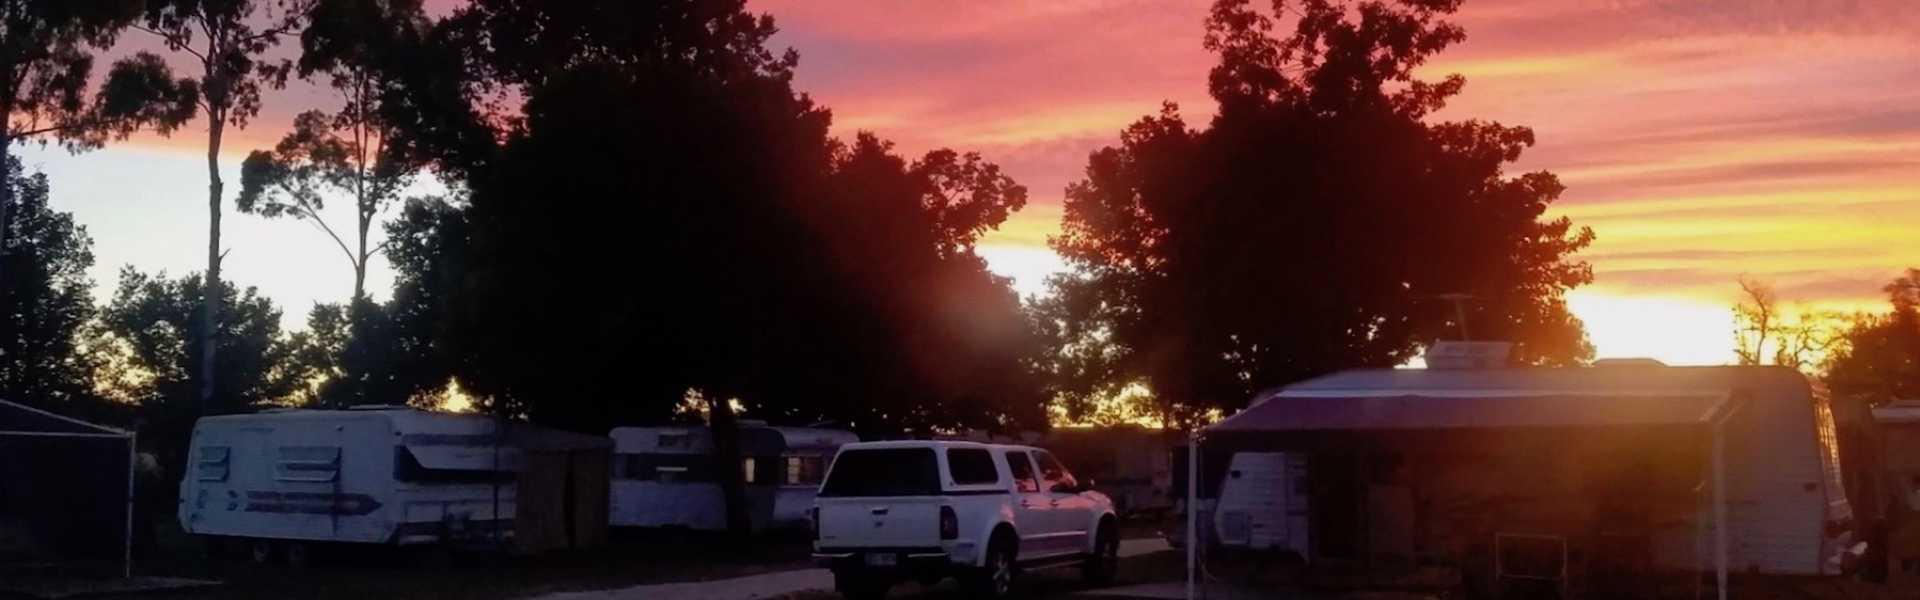 Kui Parks, Spring Creek Caravan Park, Sunset